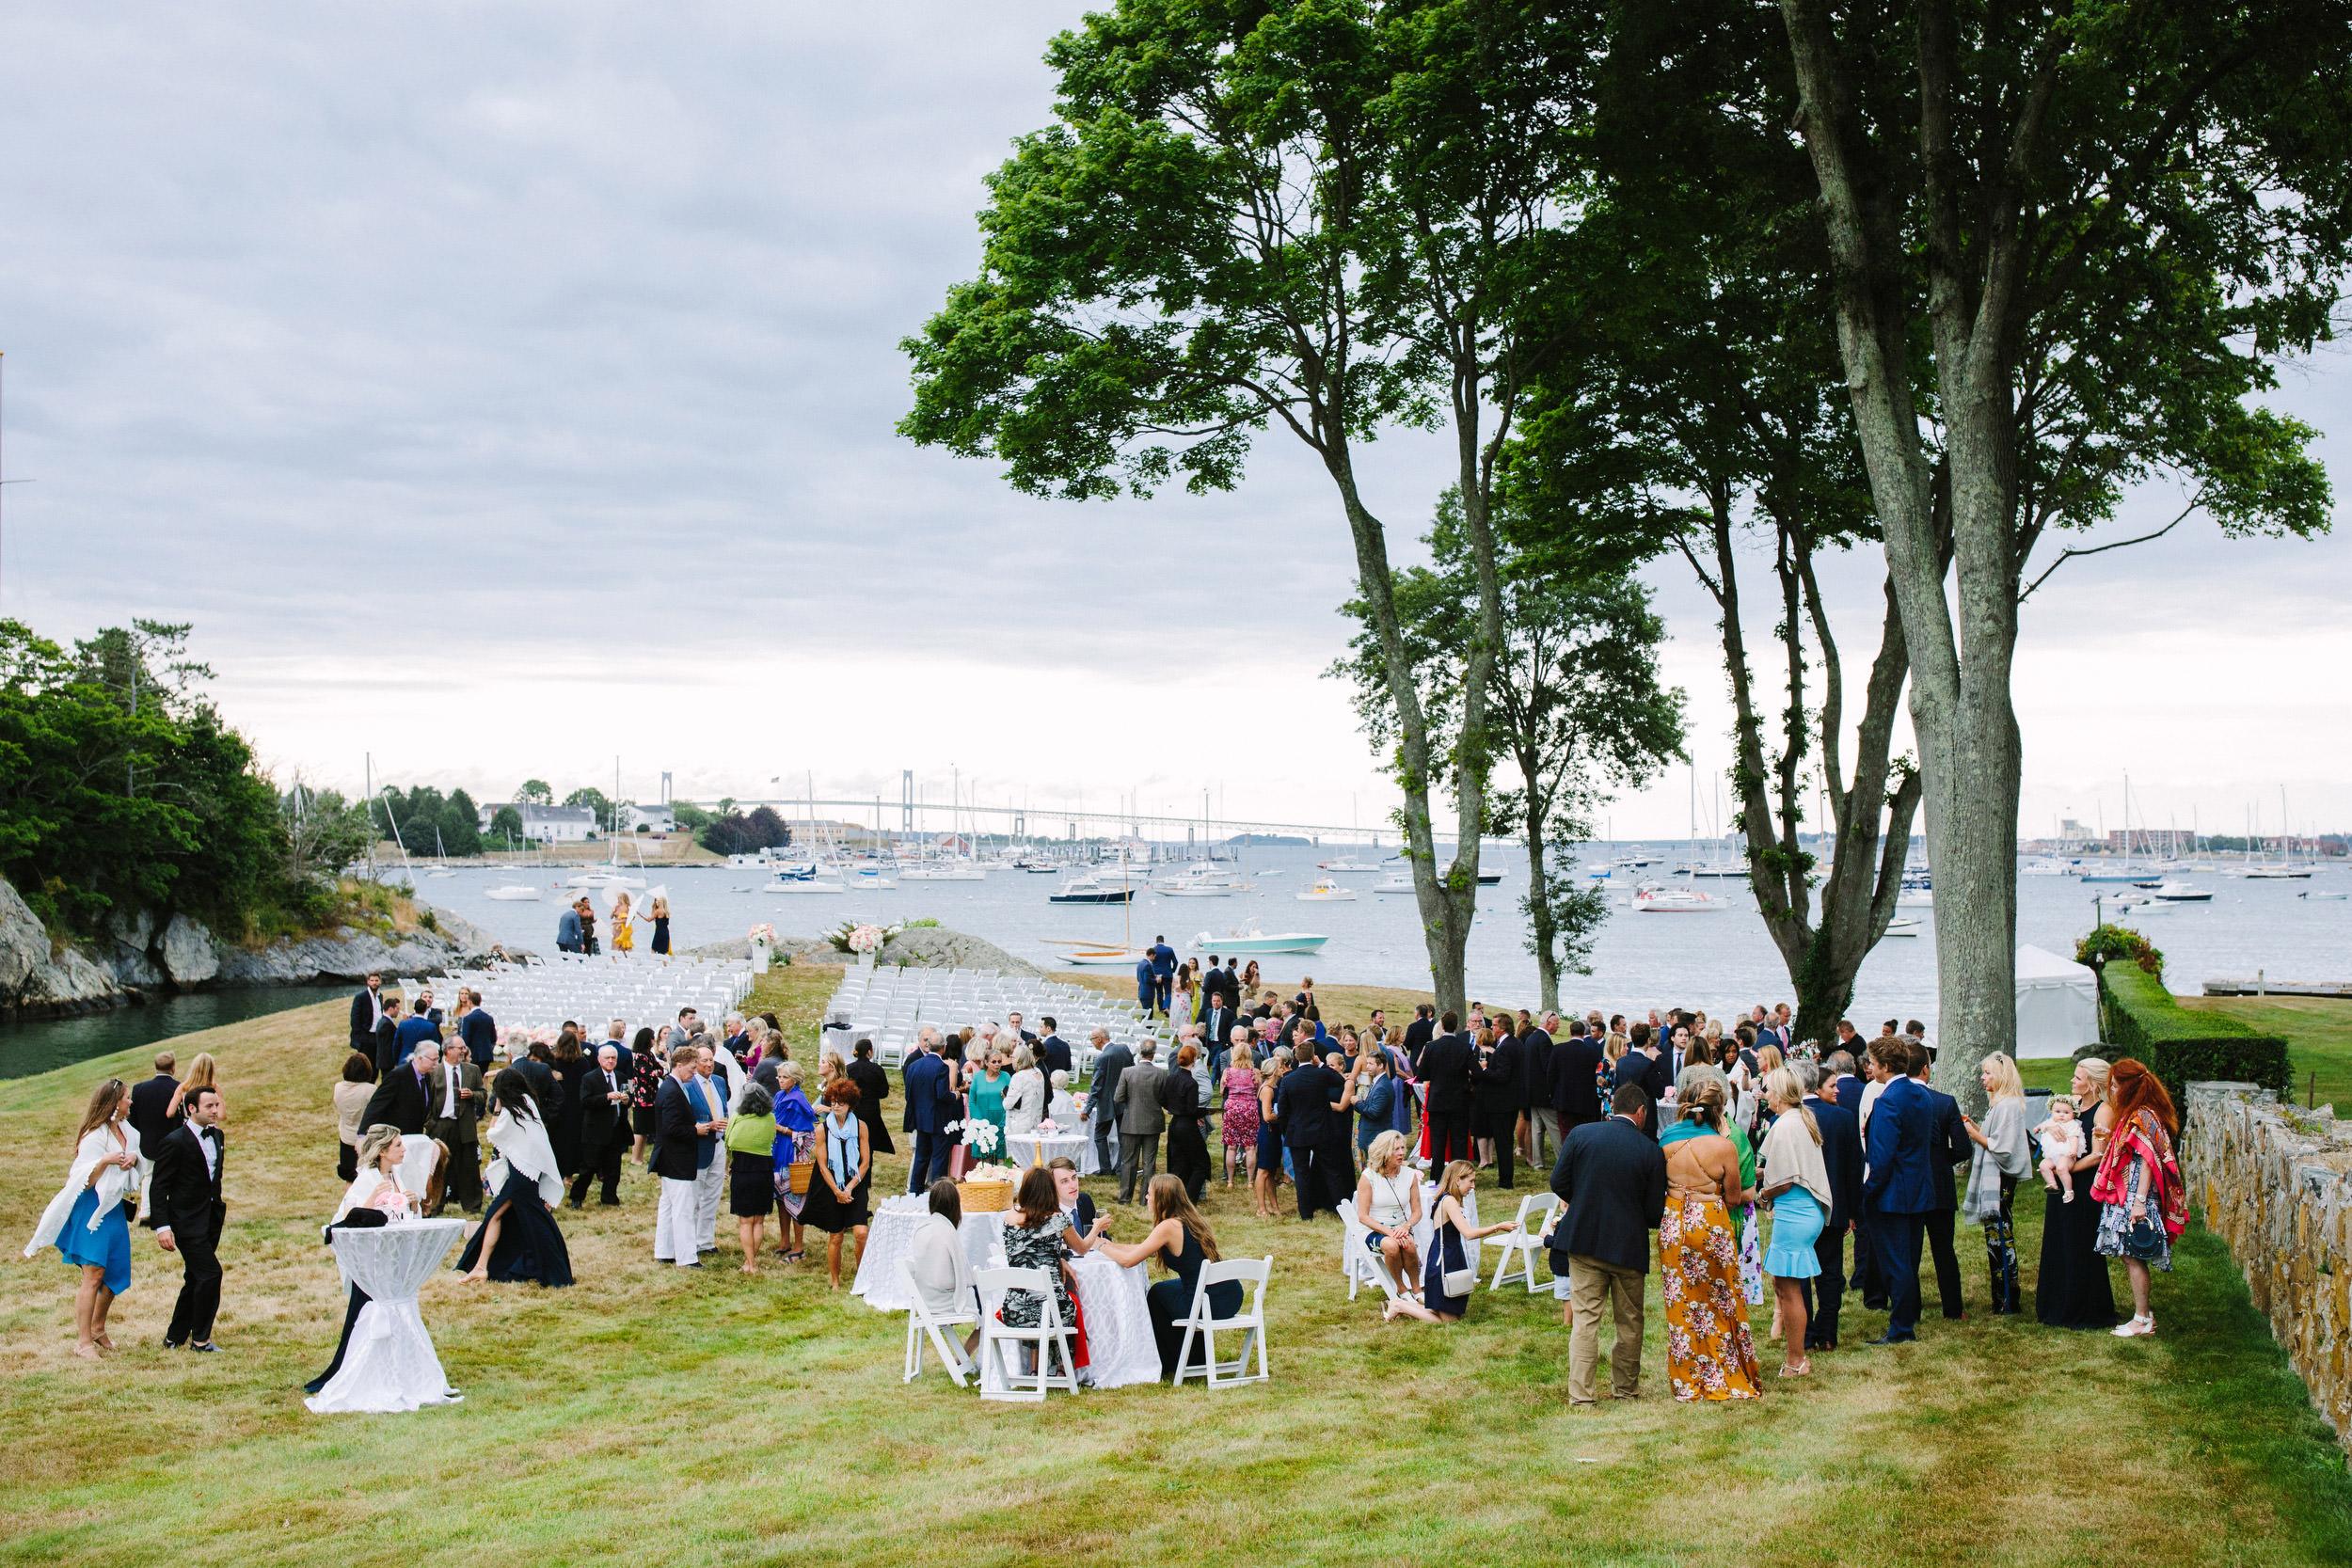 newport_rhode_island_wedding_059.jpg